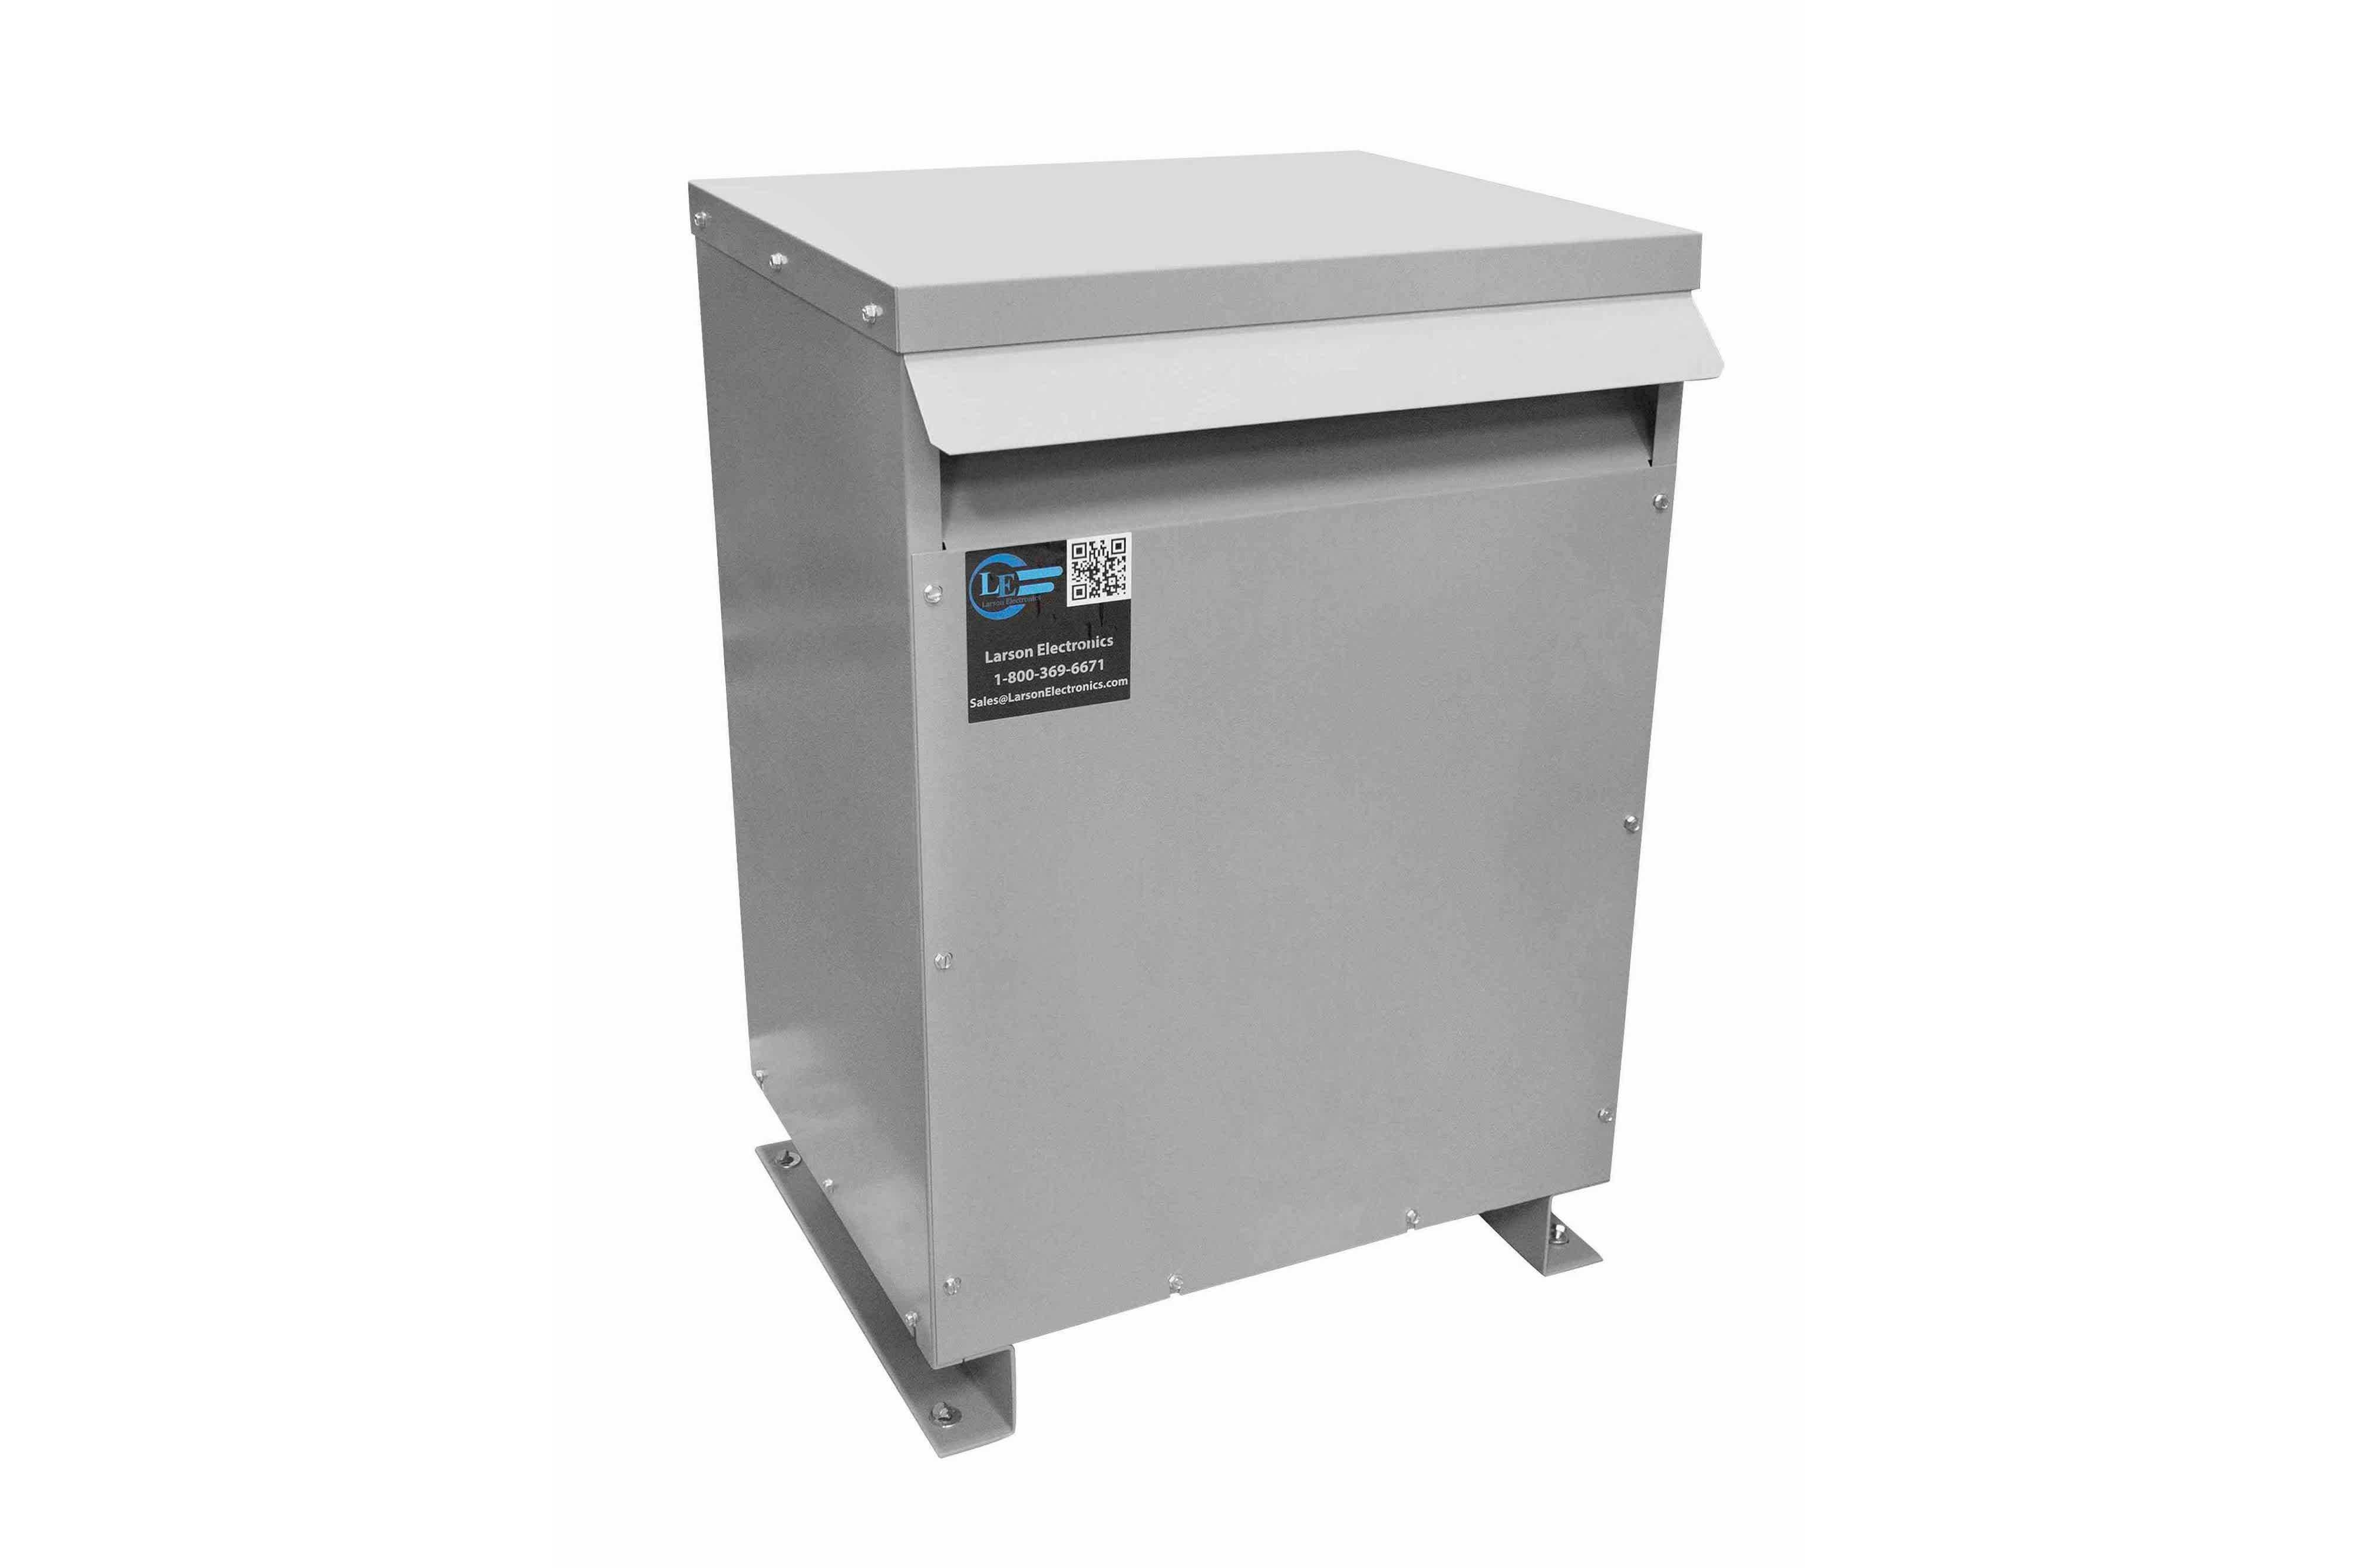 167 kVA 3PH DOE Transformer, 208V Delta Primary, 415Y/240 Wye-N Secondary, N3R, Ventilated, 60 Hz